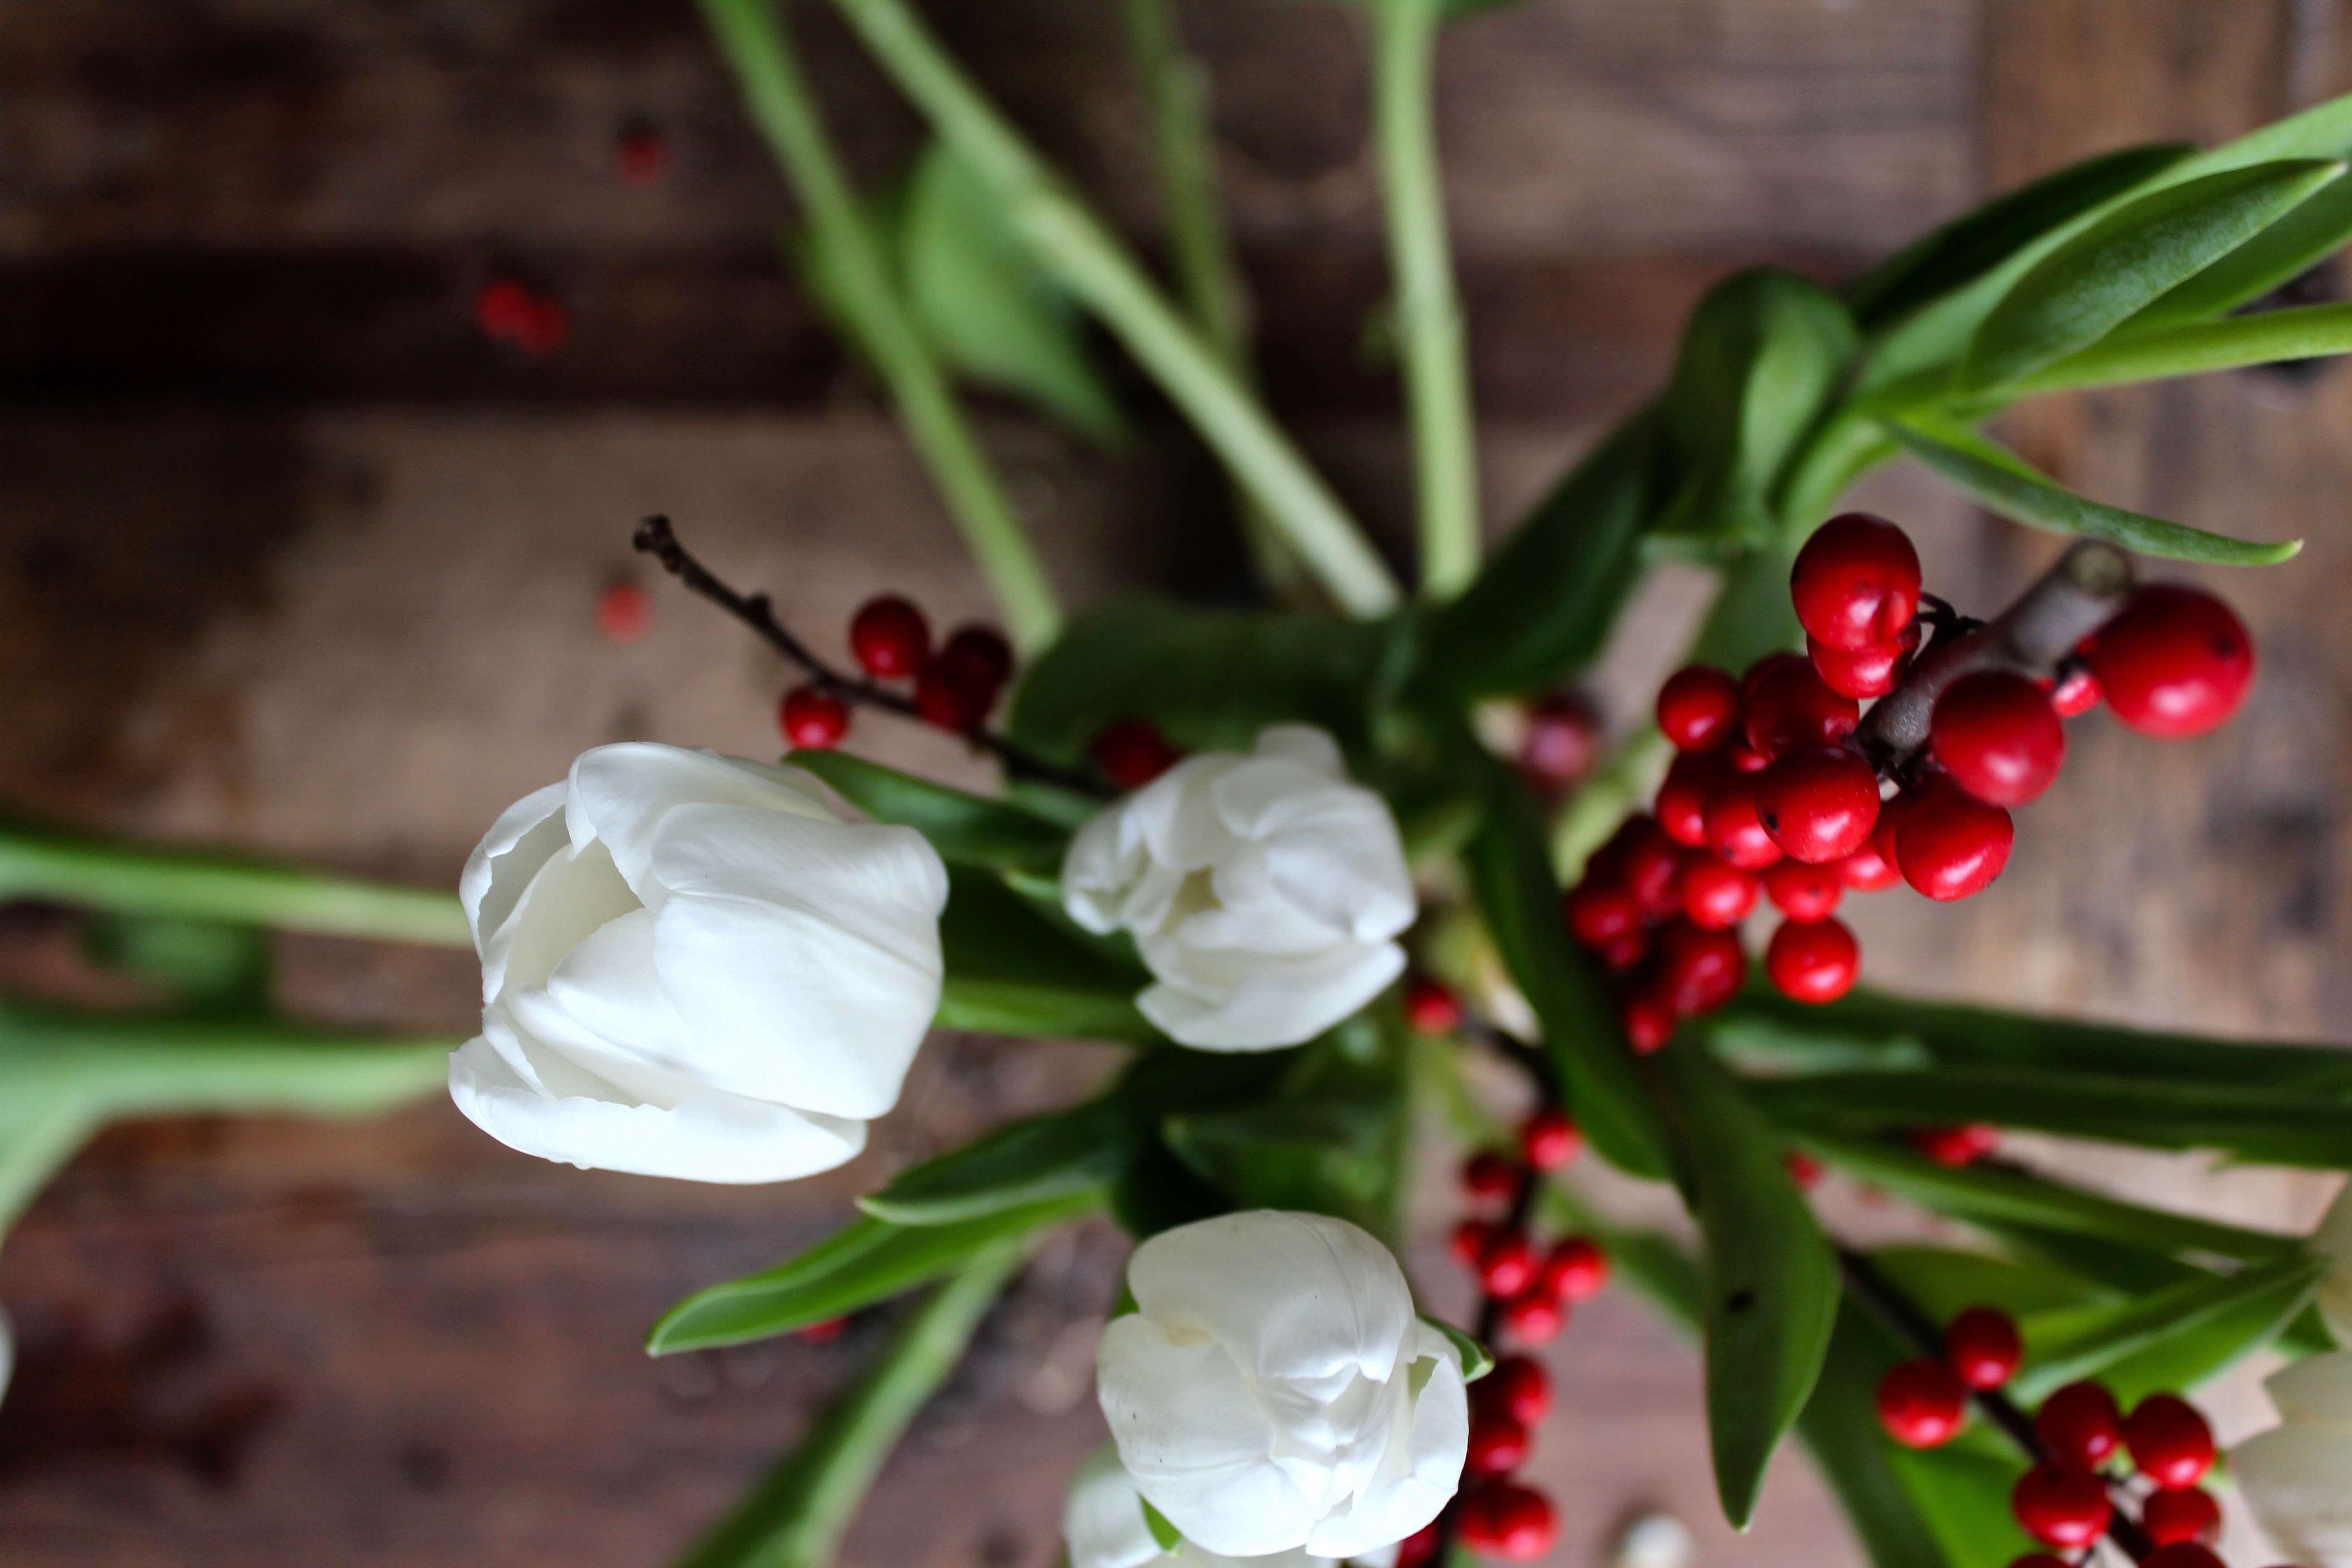 tulips-on-the-bulb-michelle-slatalla-img-3760